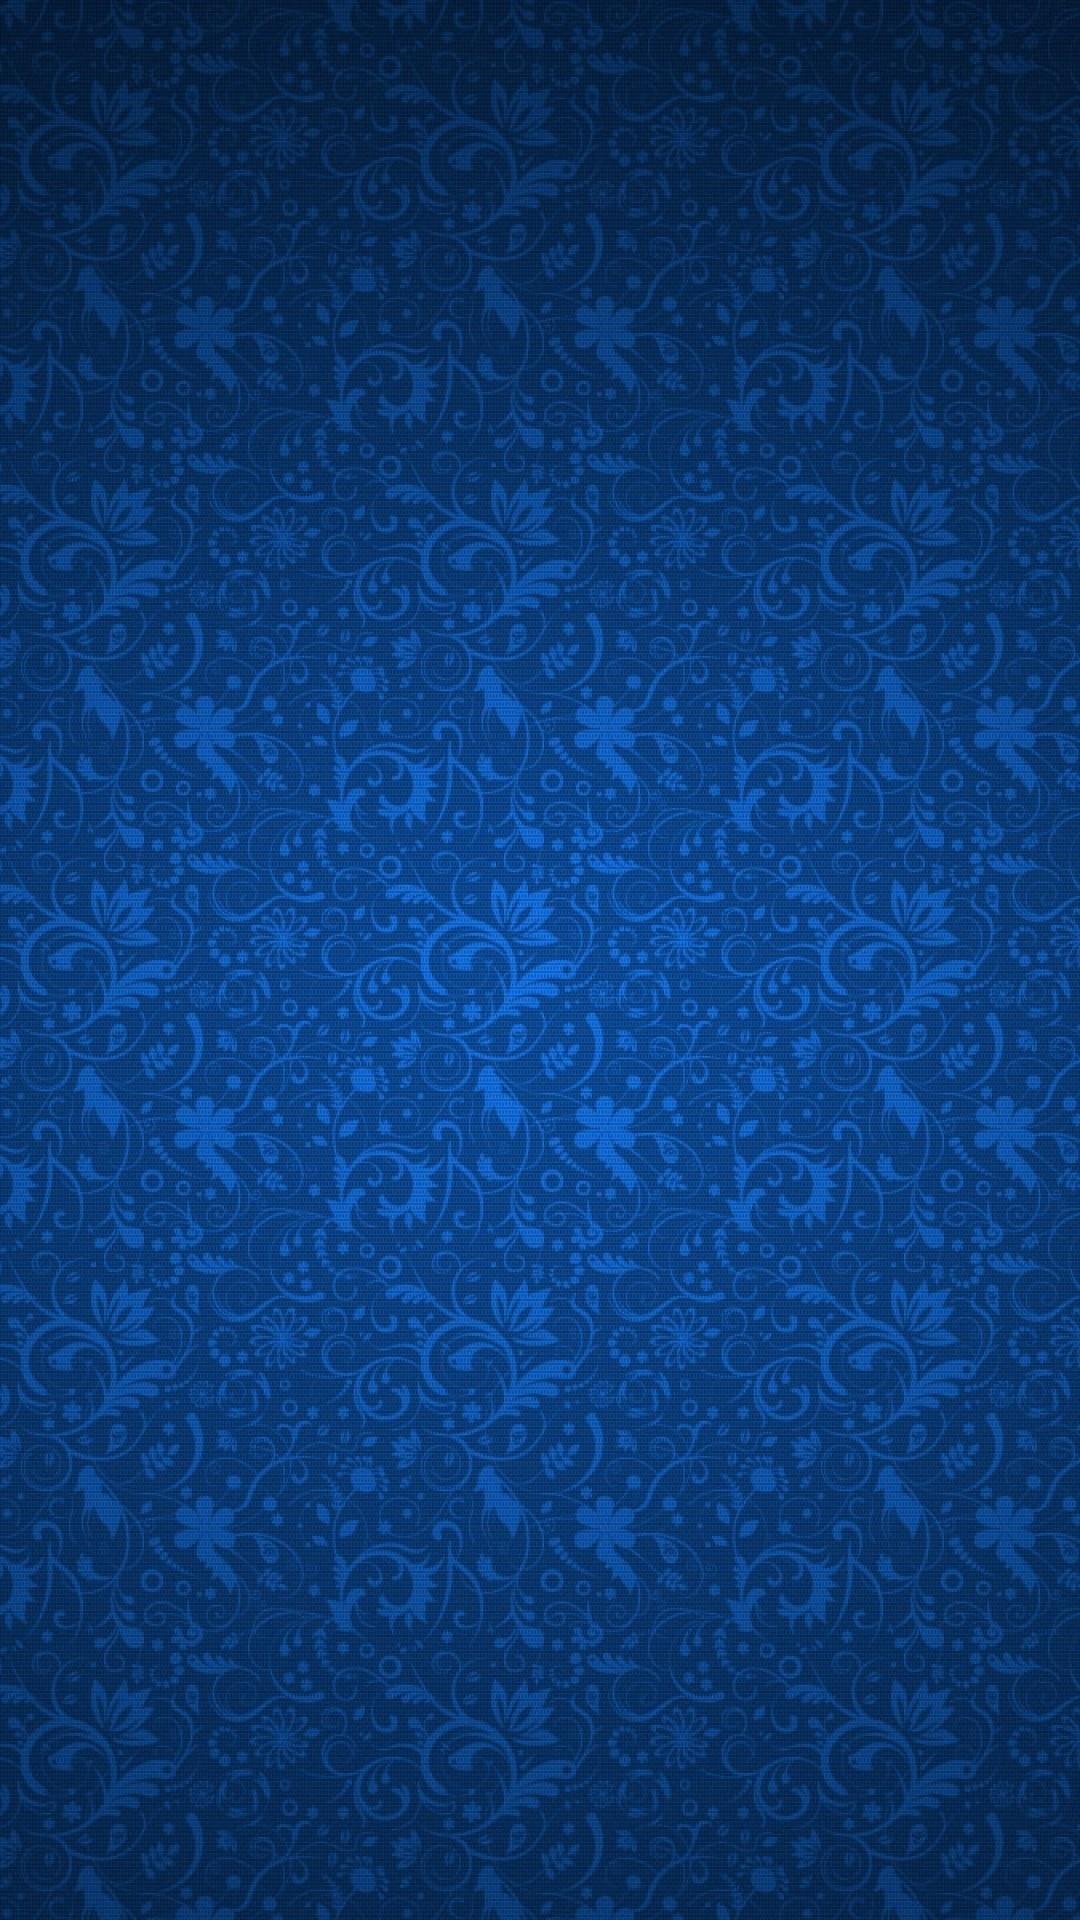 Iphone 7 Blob Wallpaper Metallic Blue Wallpaper 53 Images